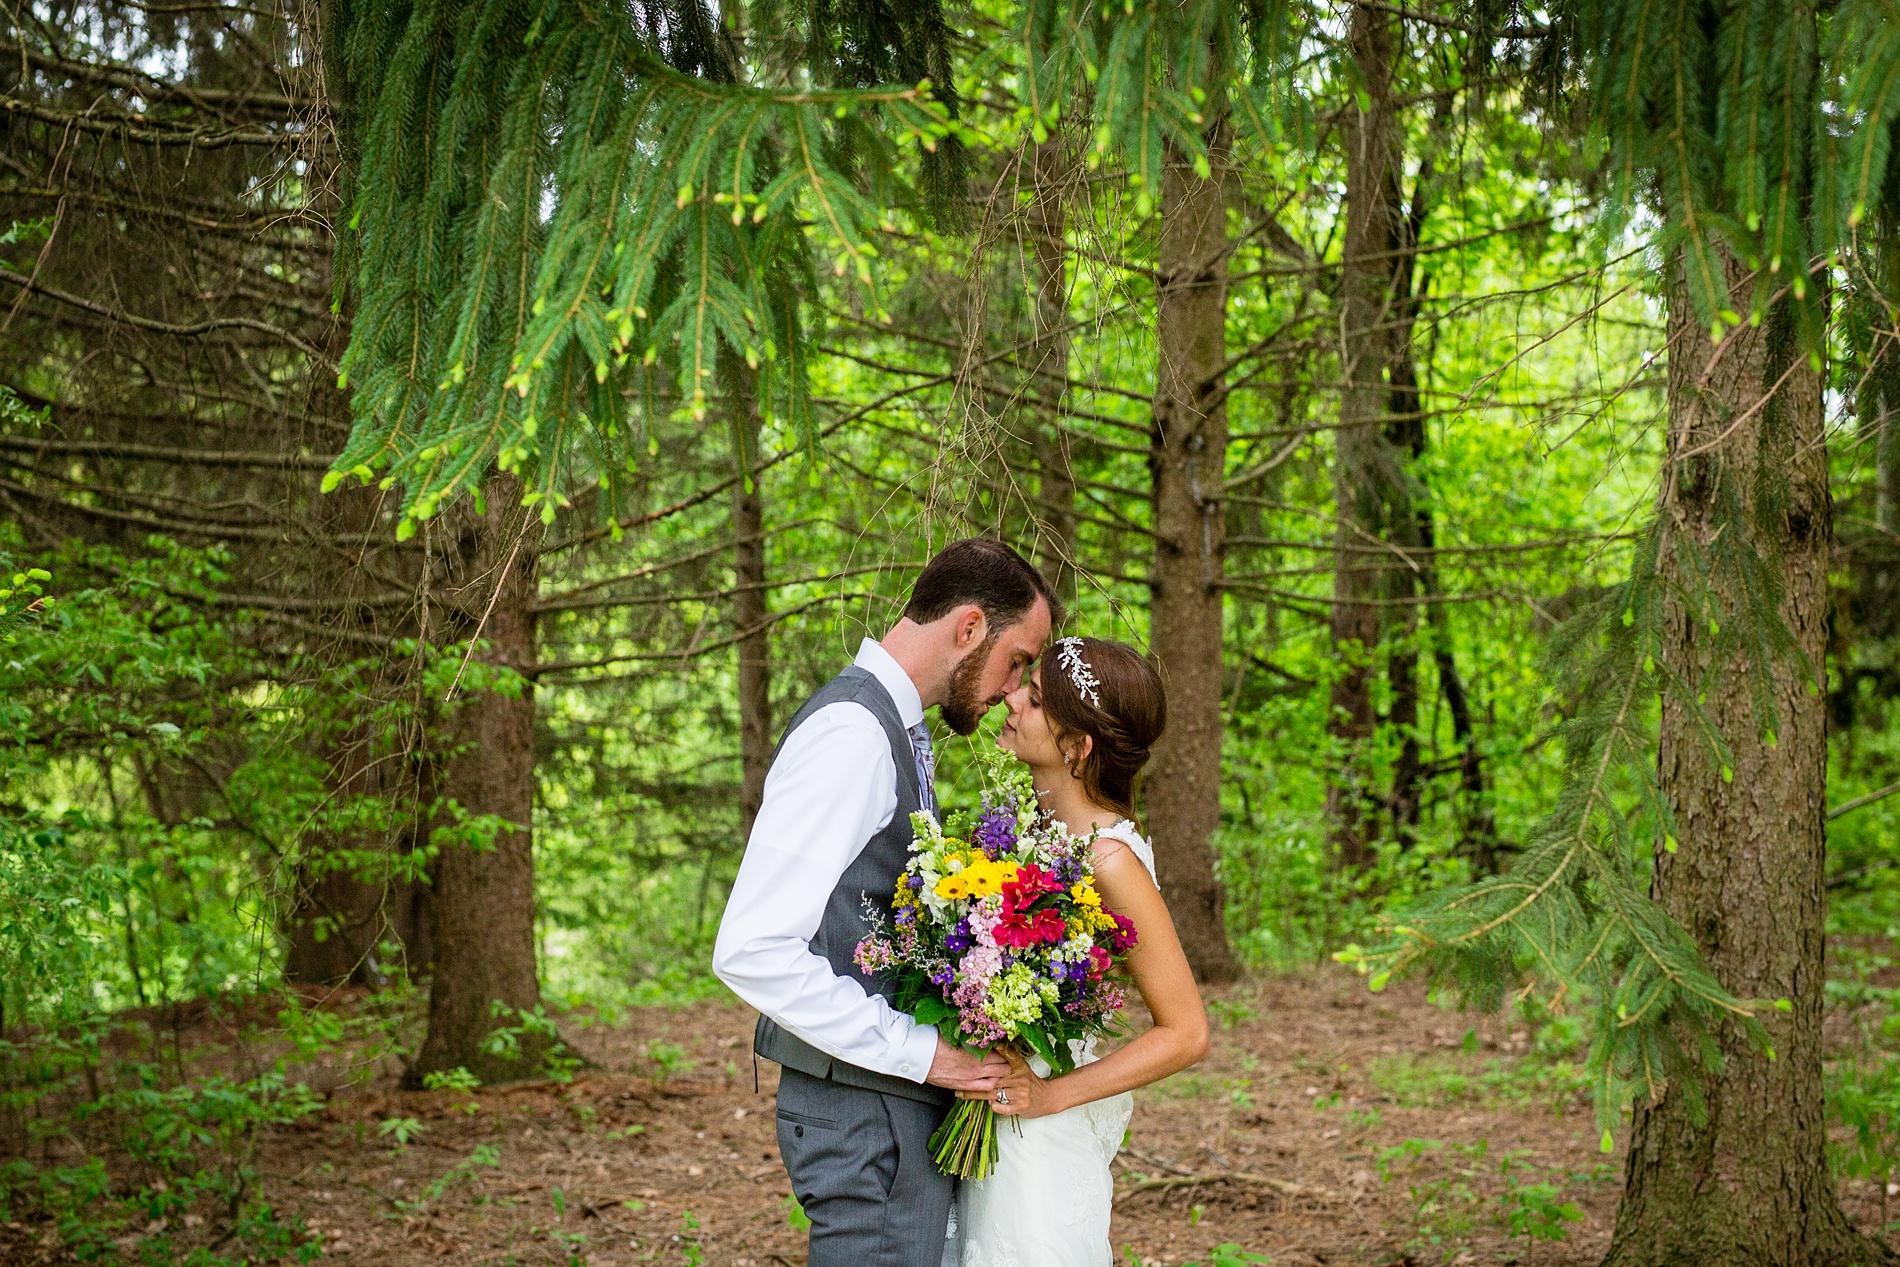 Brandon_Shafer_Photography_Brett_Autumn_Wedding_0046.jpg